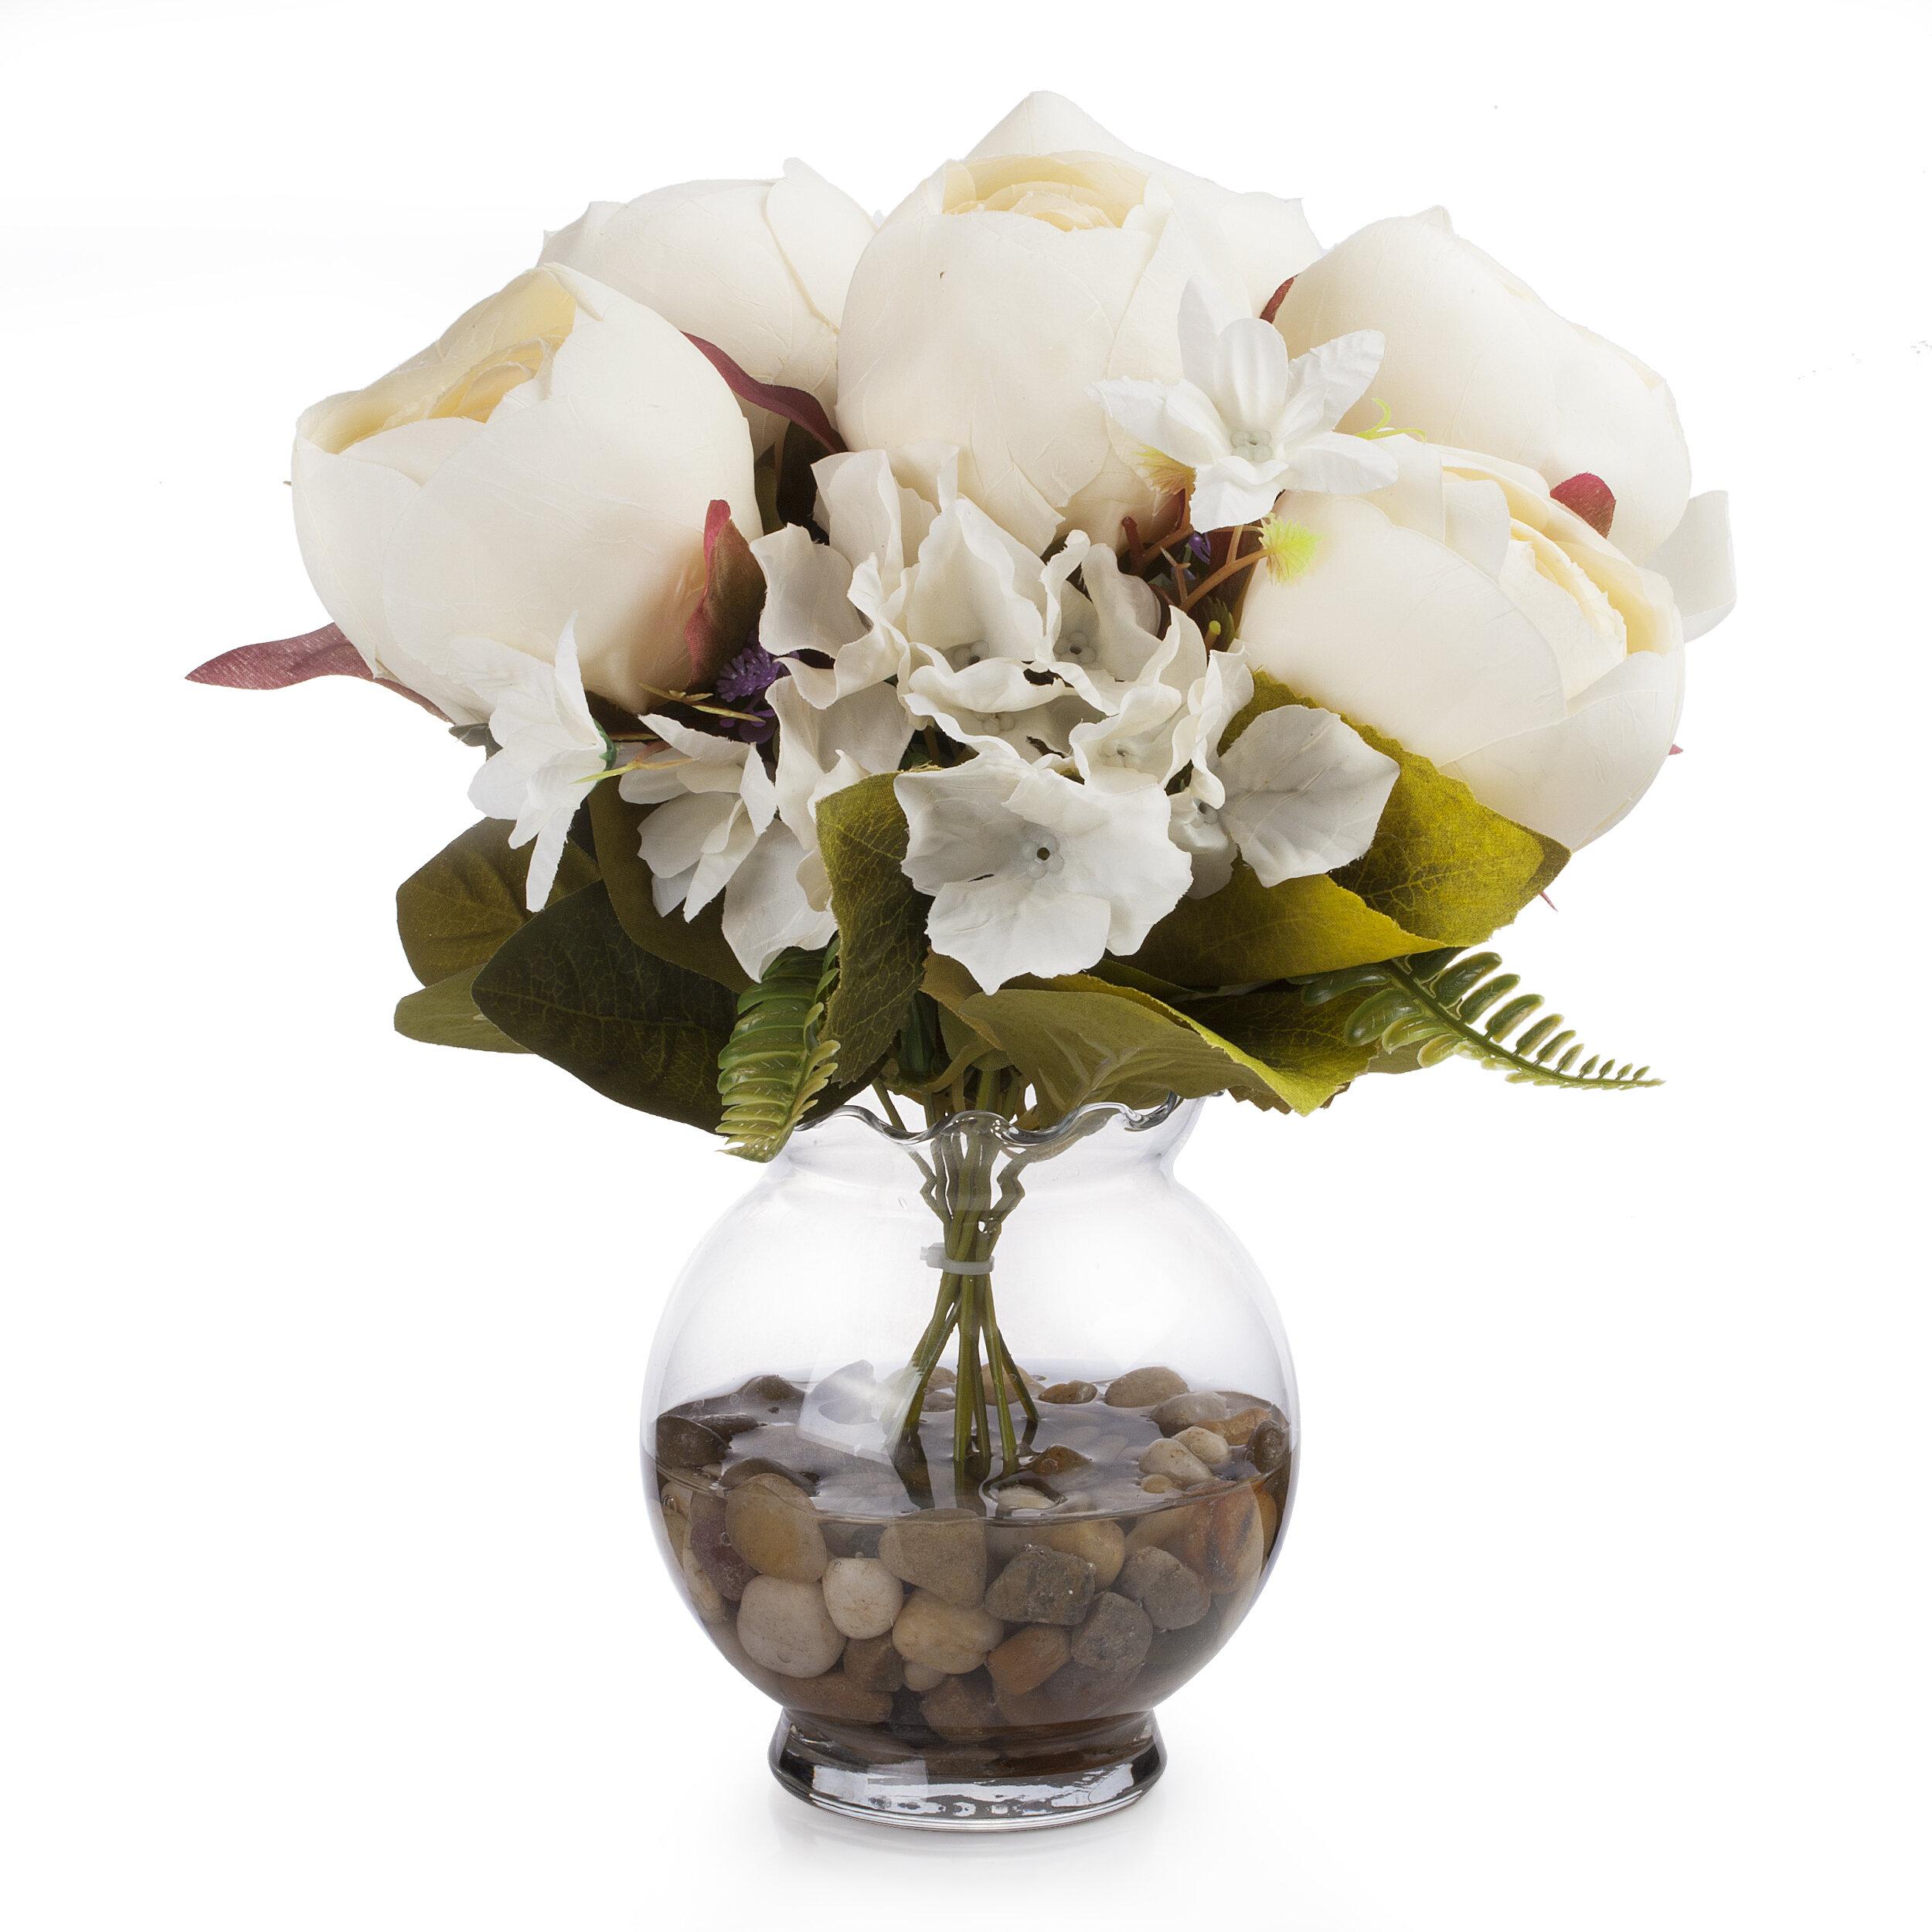 Latitude Run Silk Peony And Hydrangea Mixed Floral Arrangement In Vase Wayfair